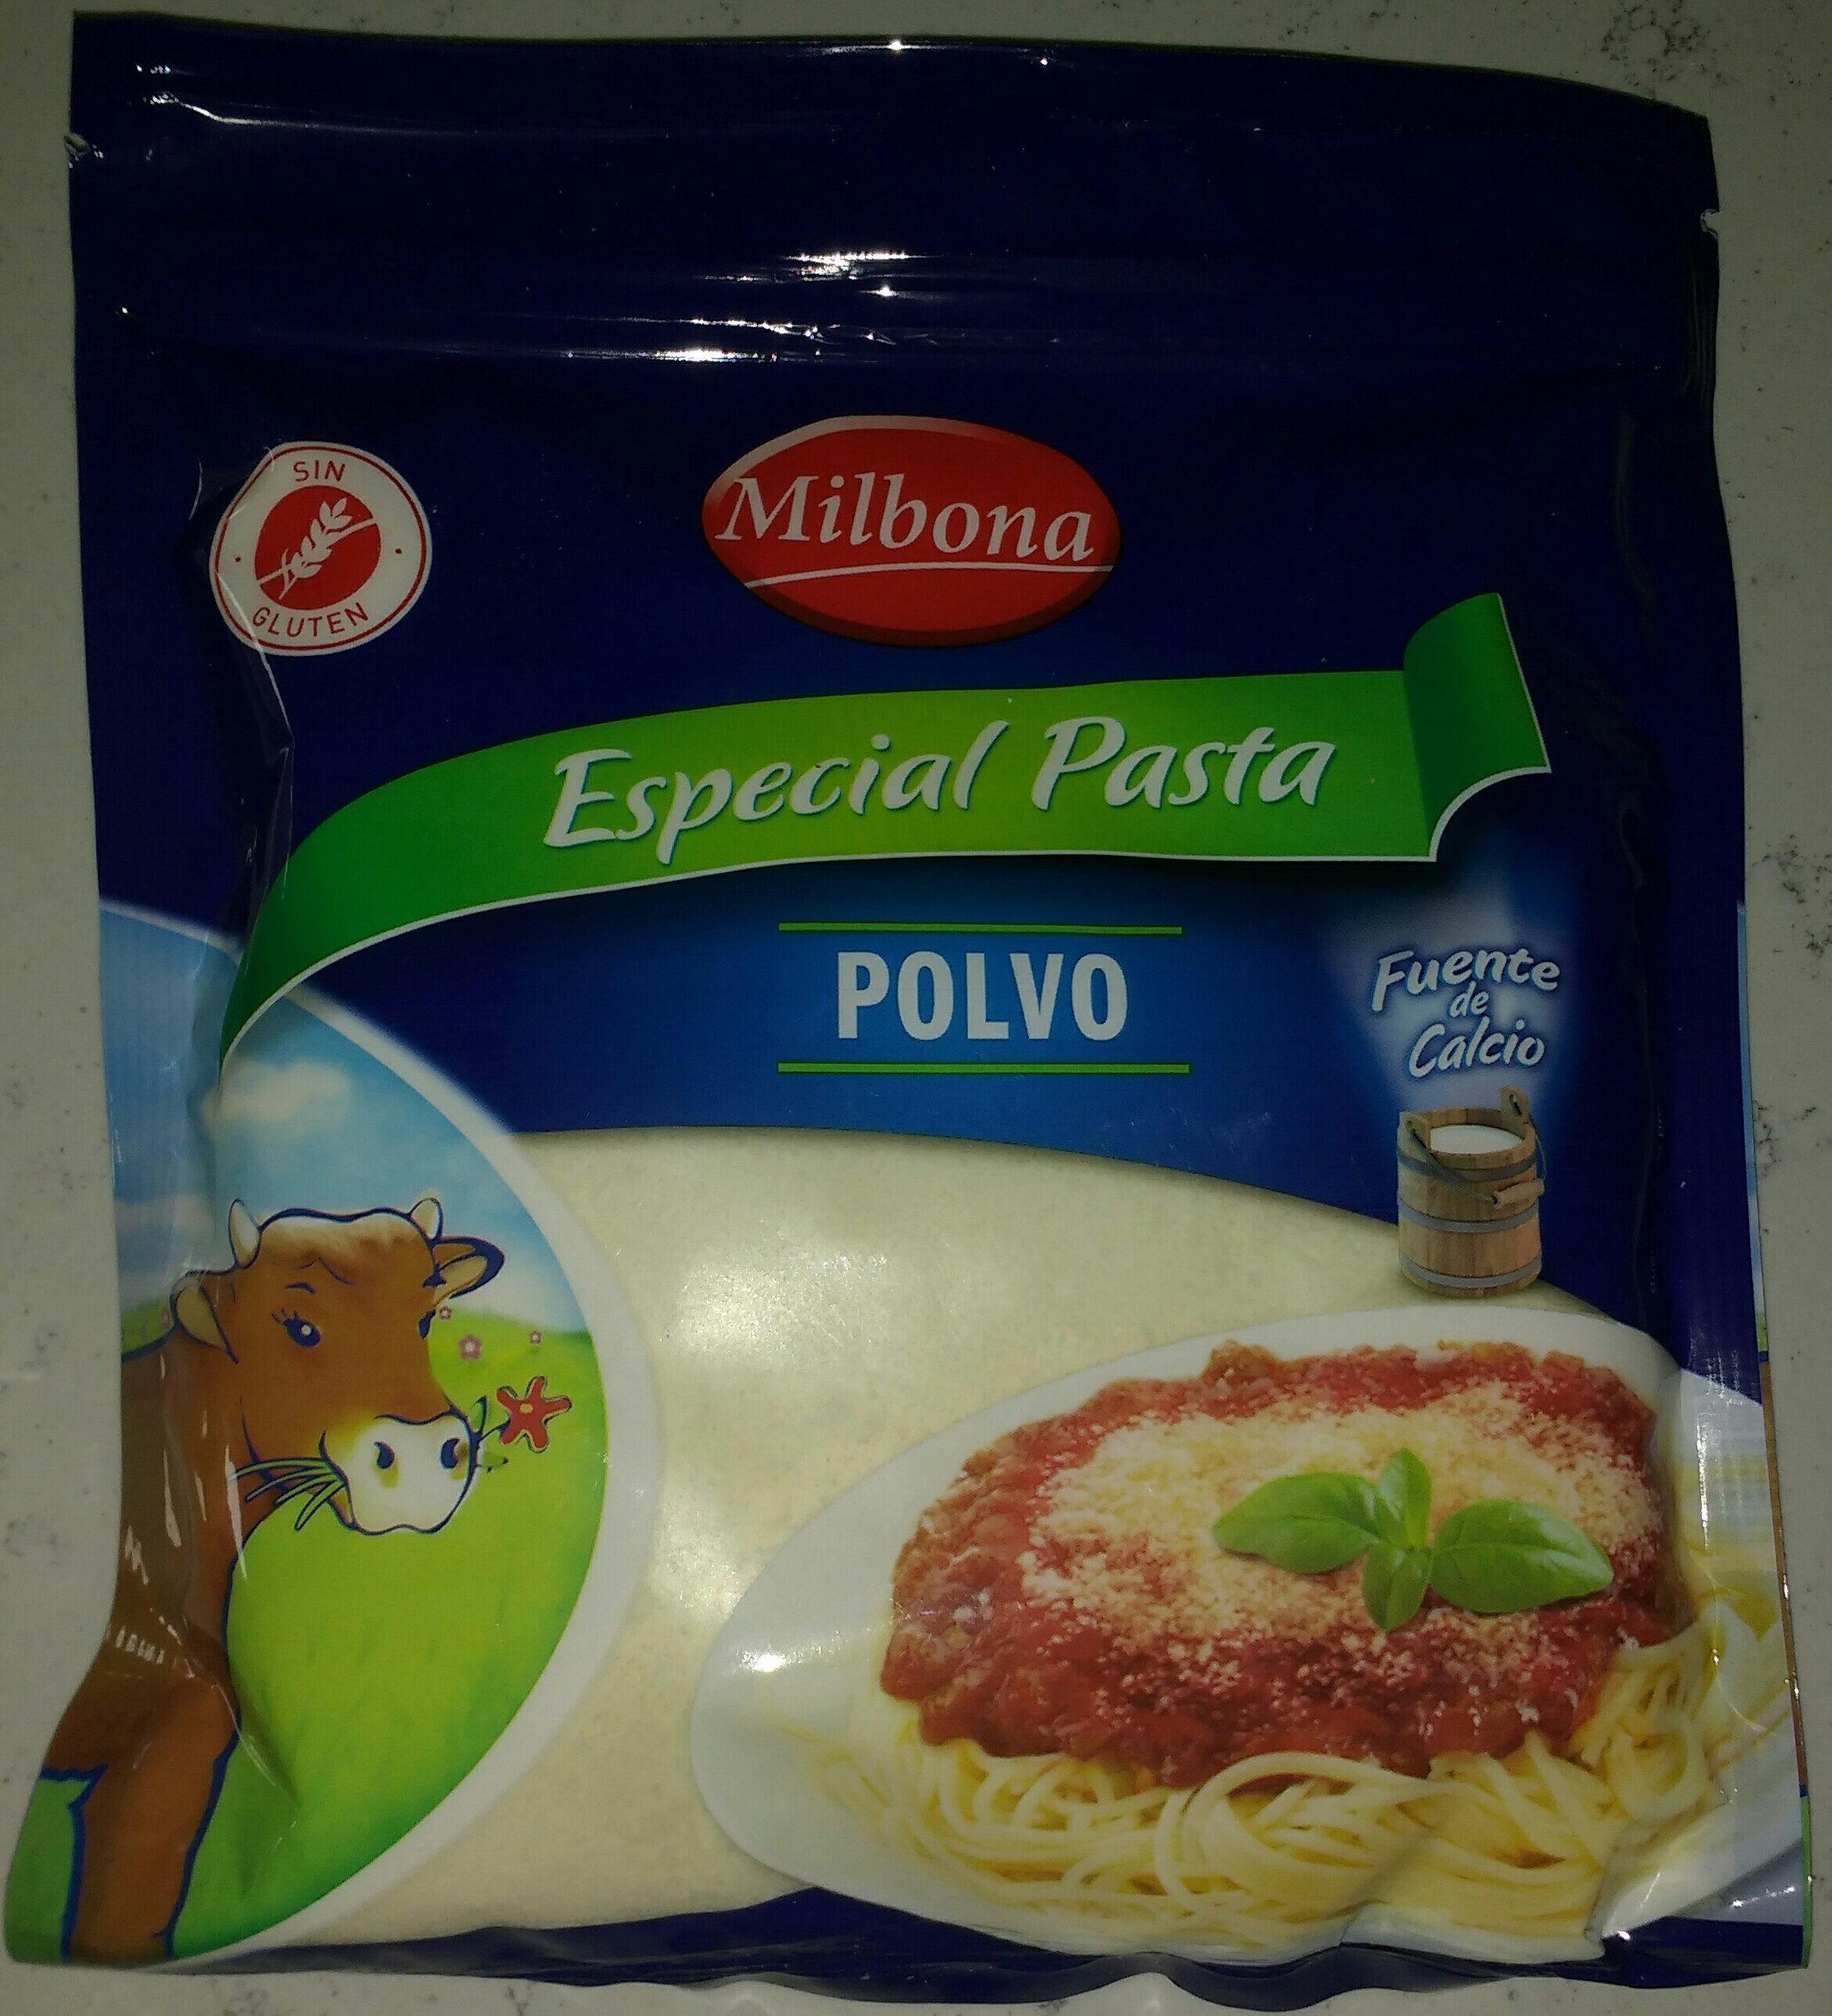 Polvo especial pasta - Producte - es